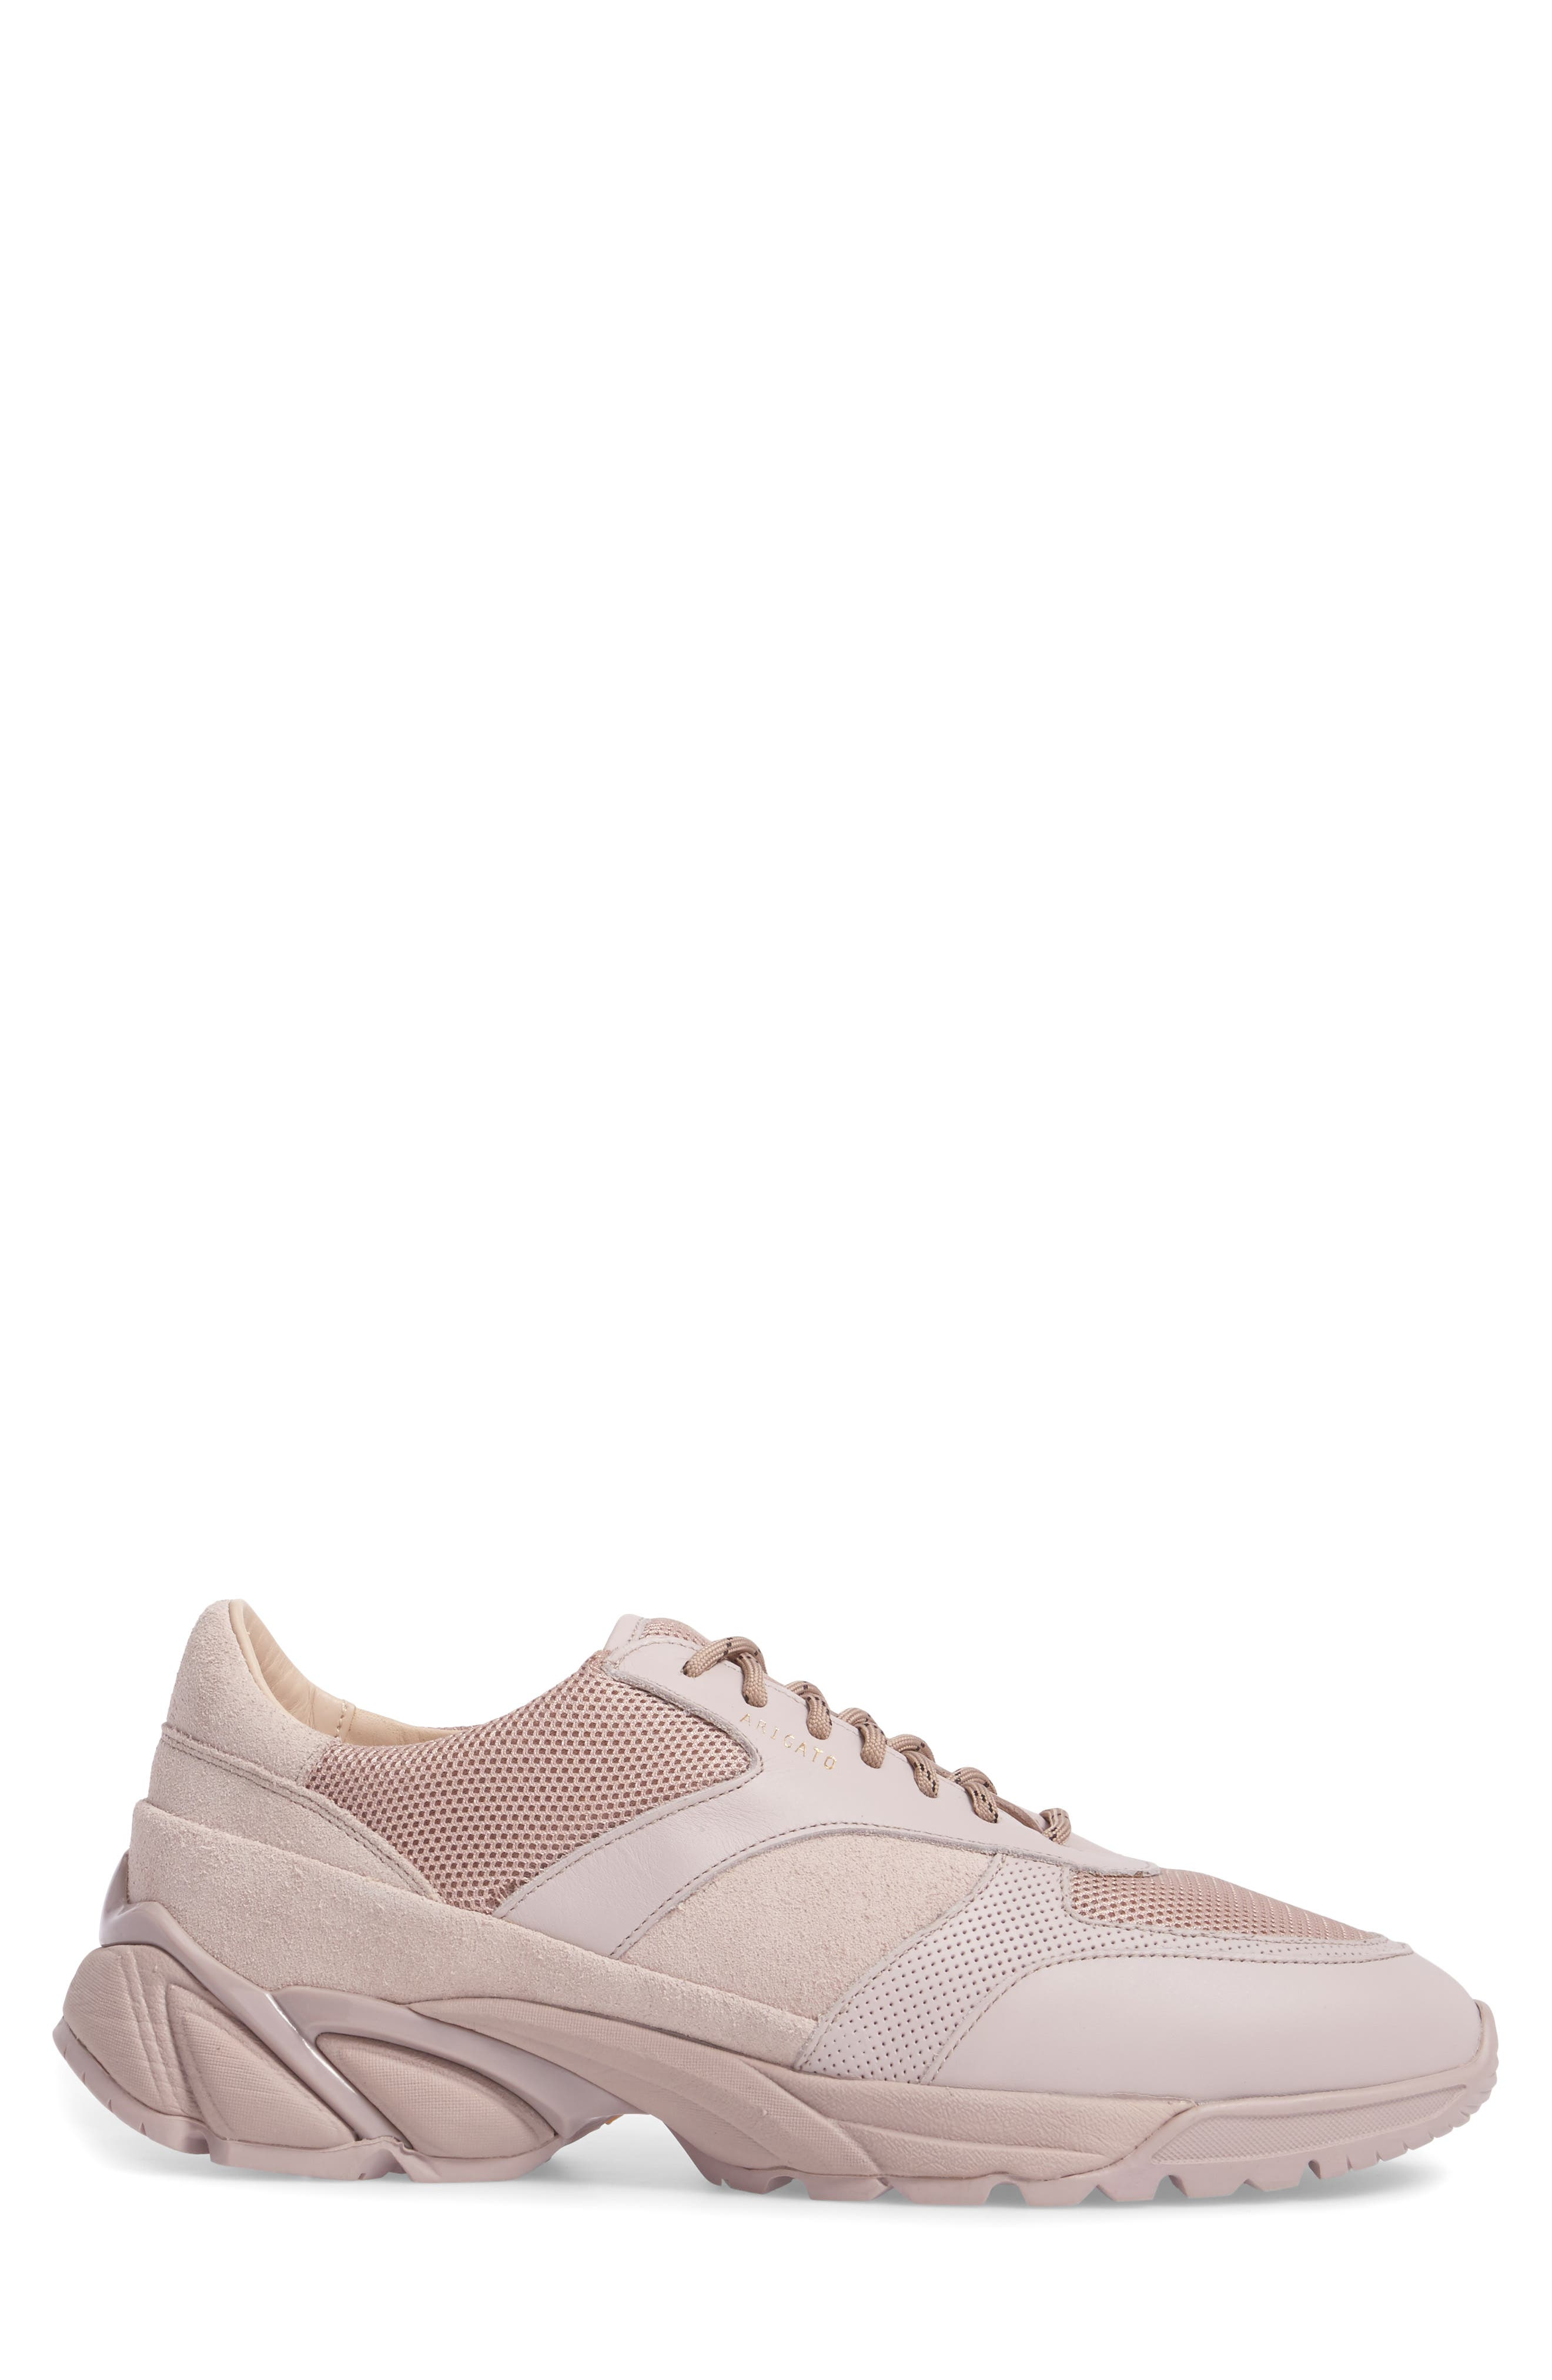 Tech Sneaker,                             Alternate thumbnail 3, color,                             Pale Lilac